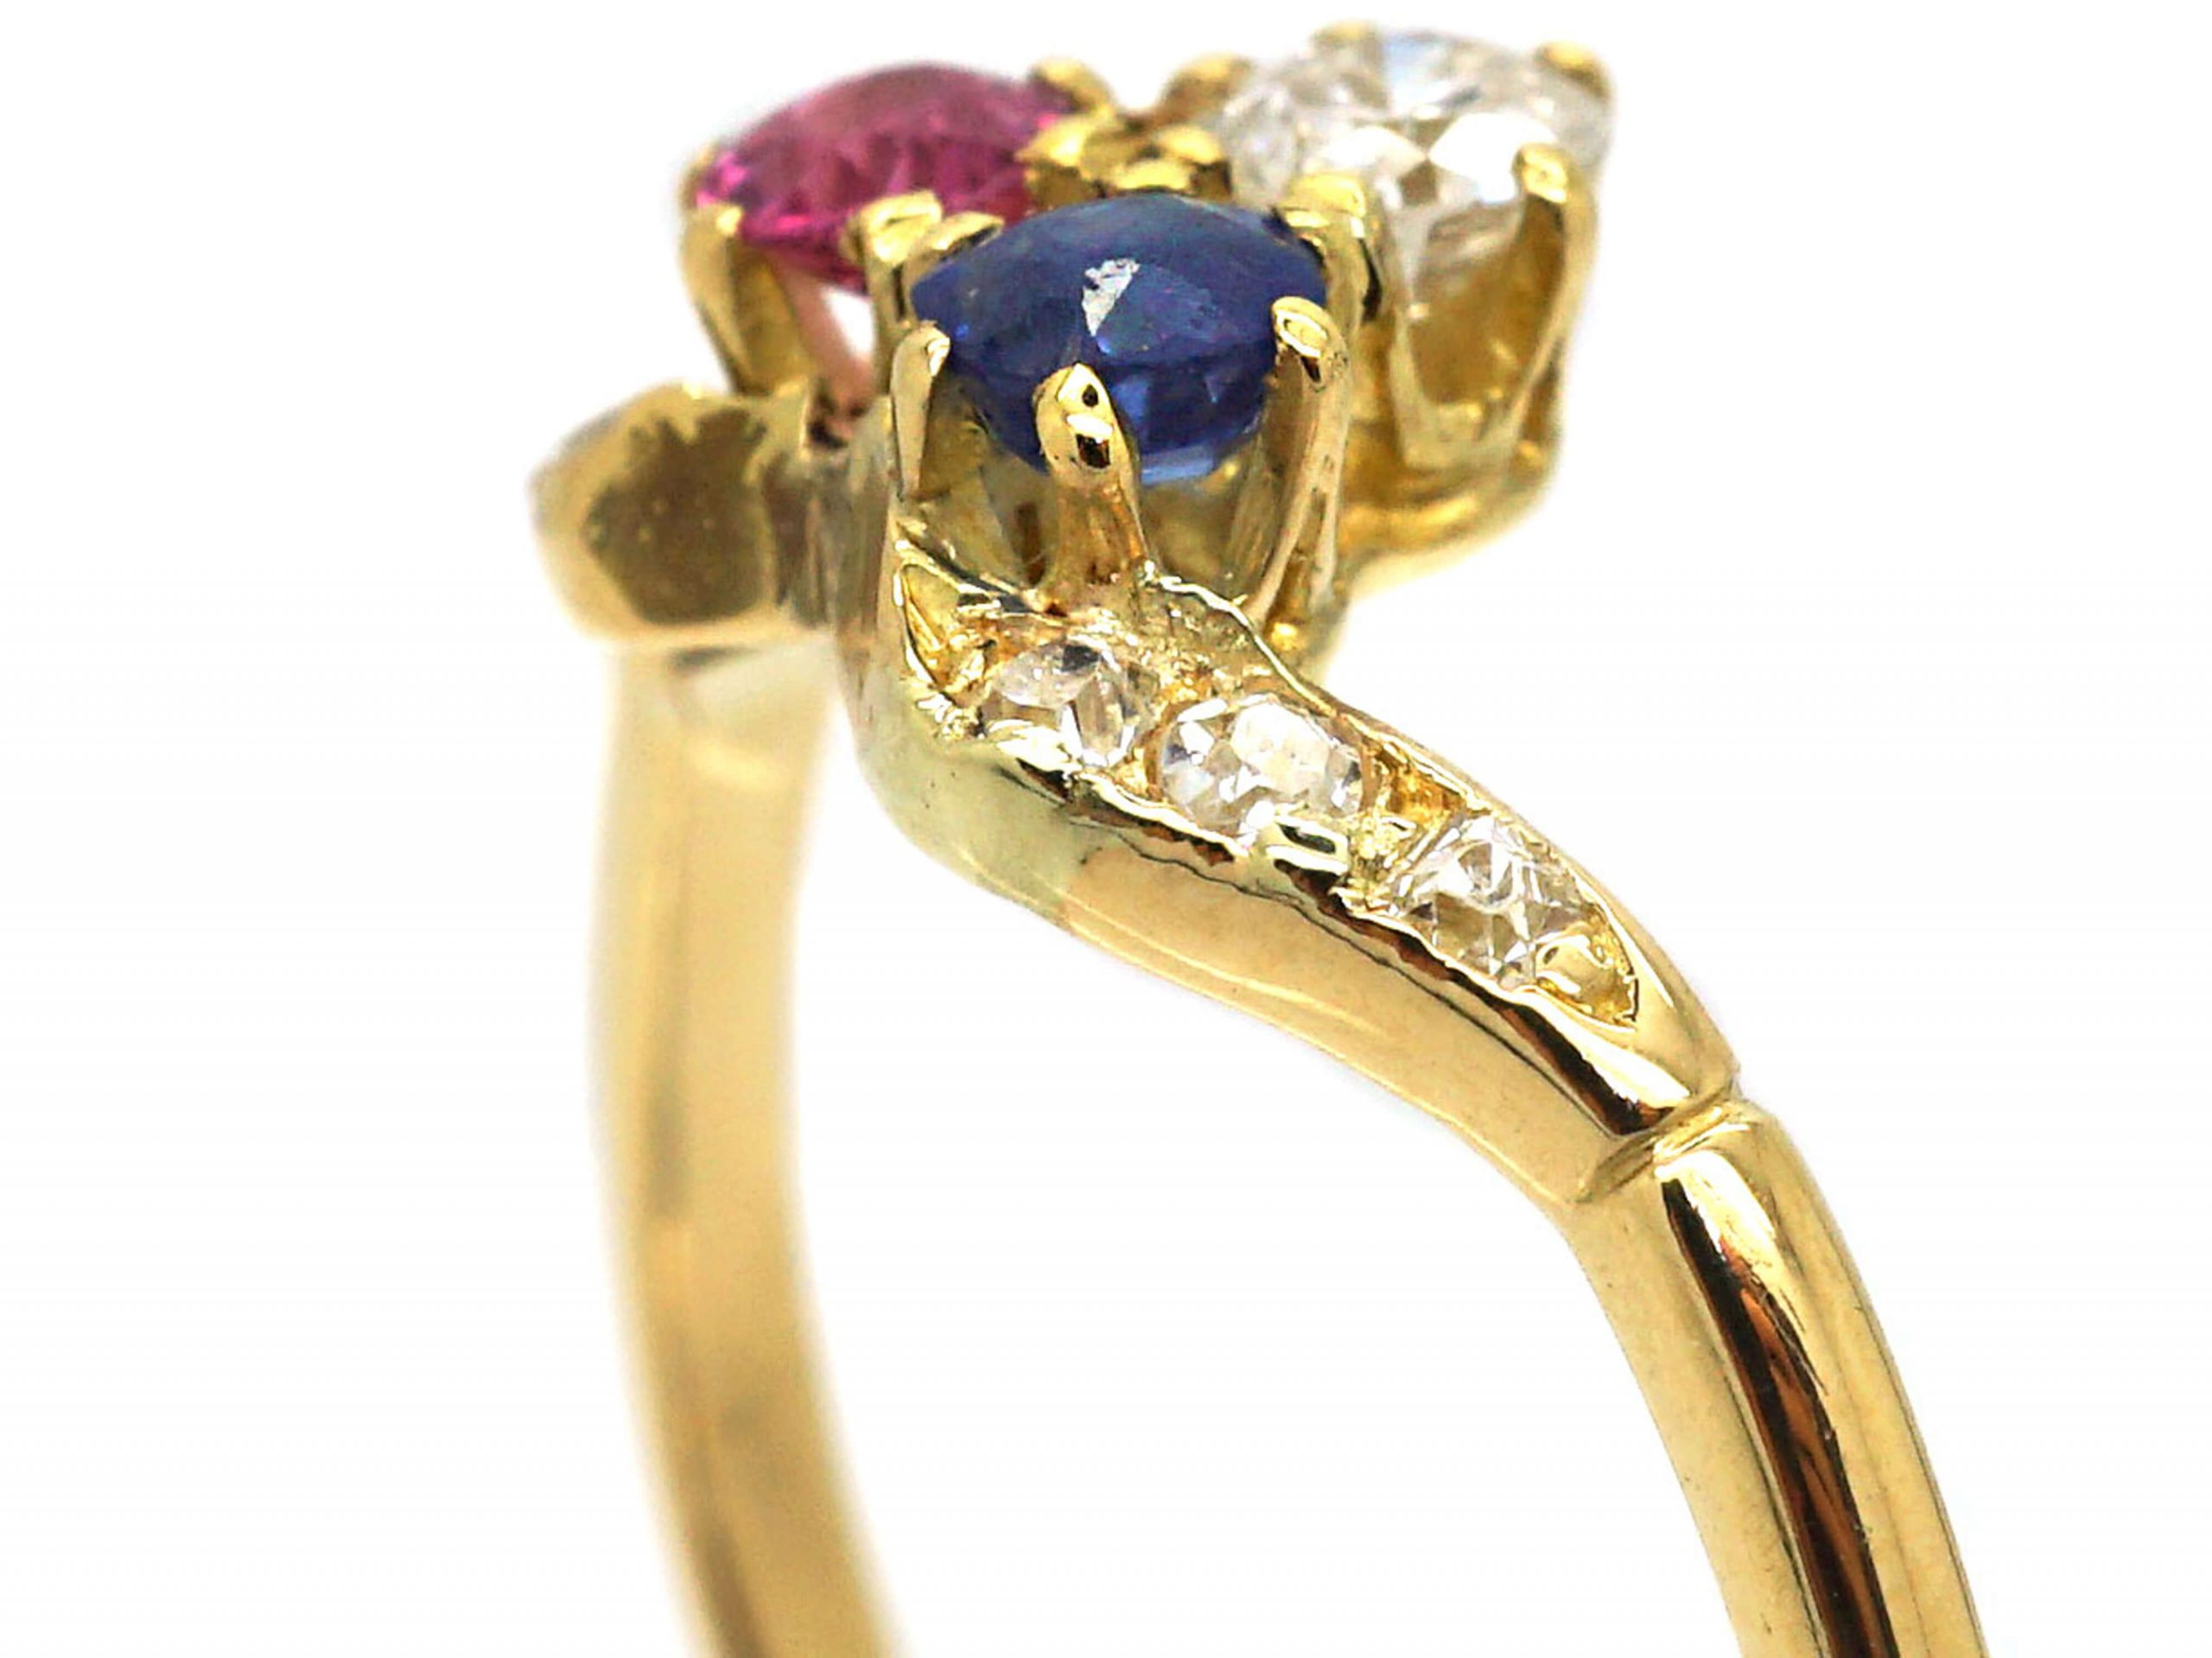 Art Nouveau 18ct Gold, Sapphire, Ruby & Diamond Ring with Diamond Set Shoulders